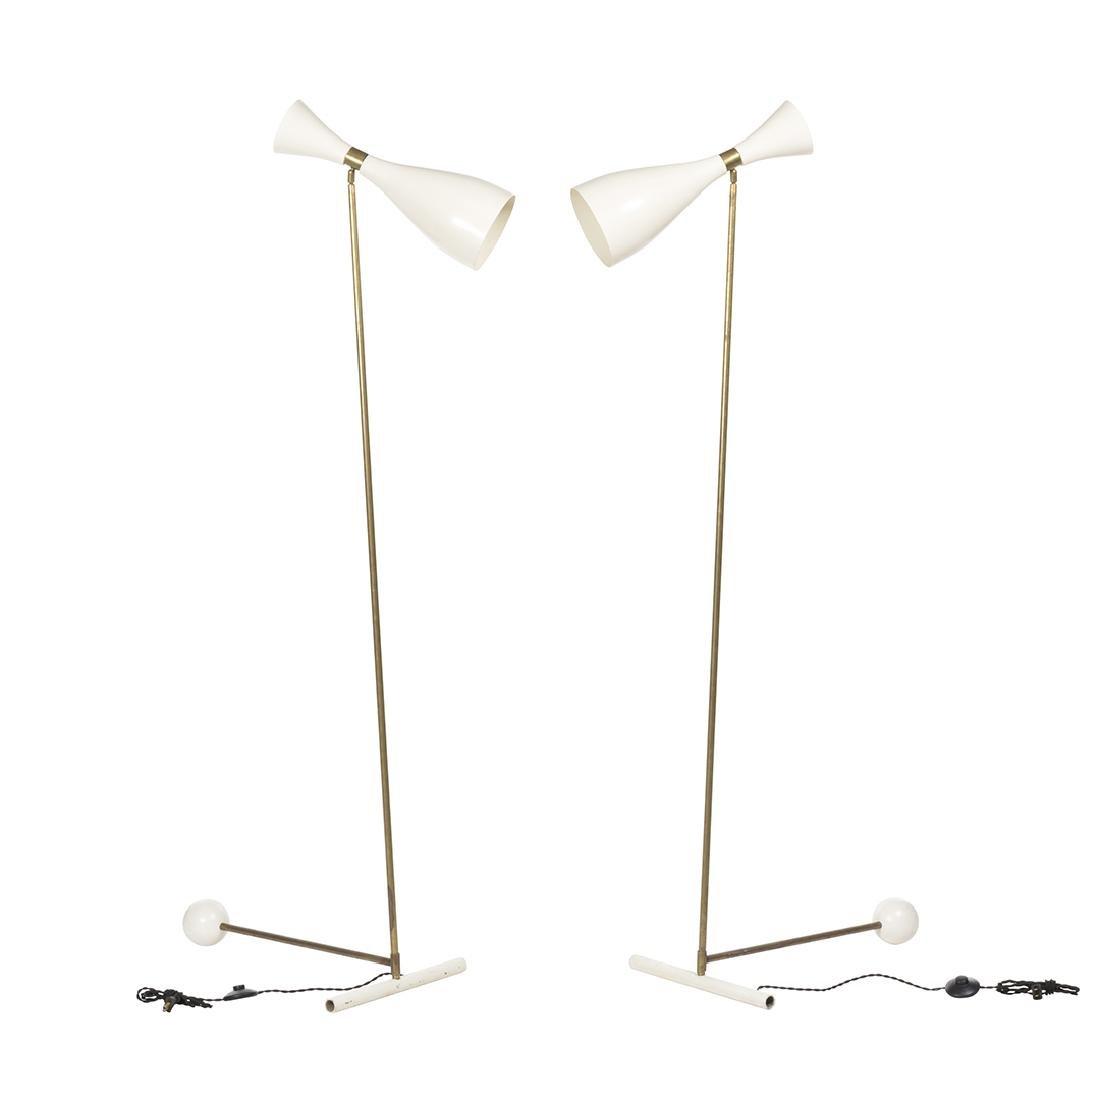 Italian Adjustable Floor Lamps (2)